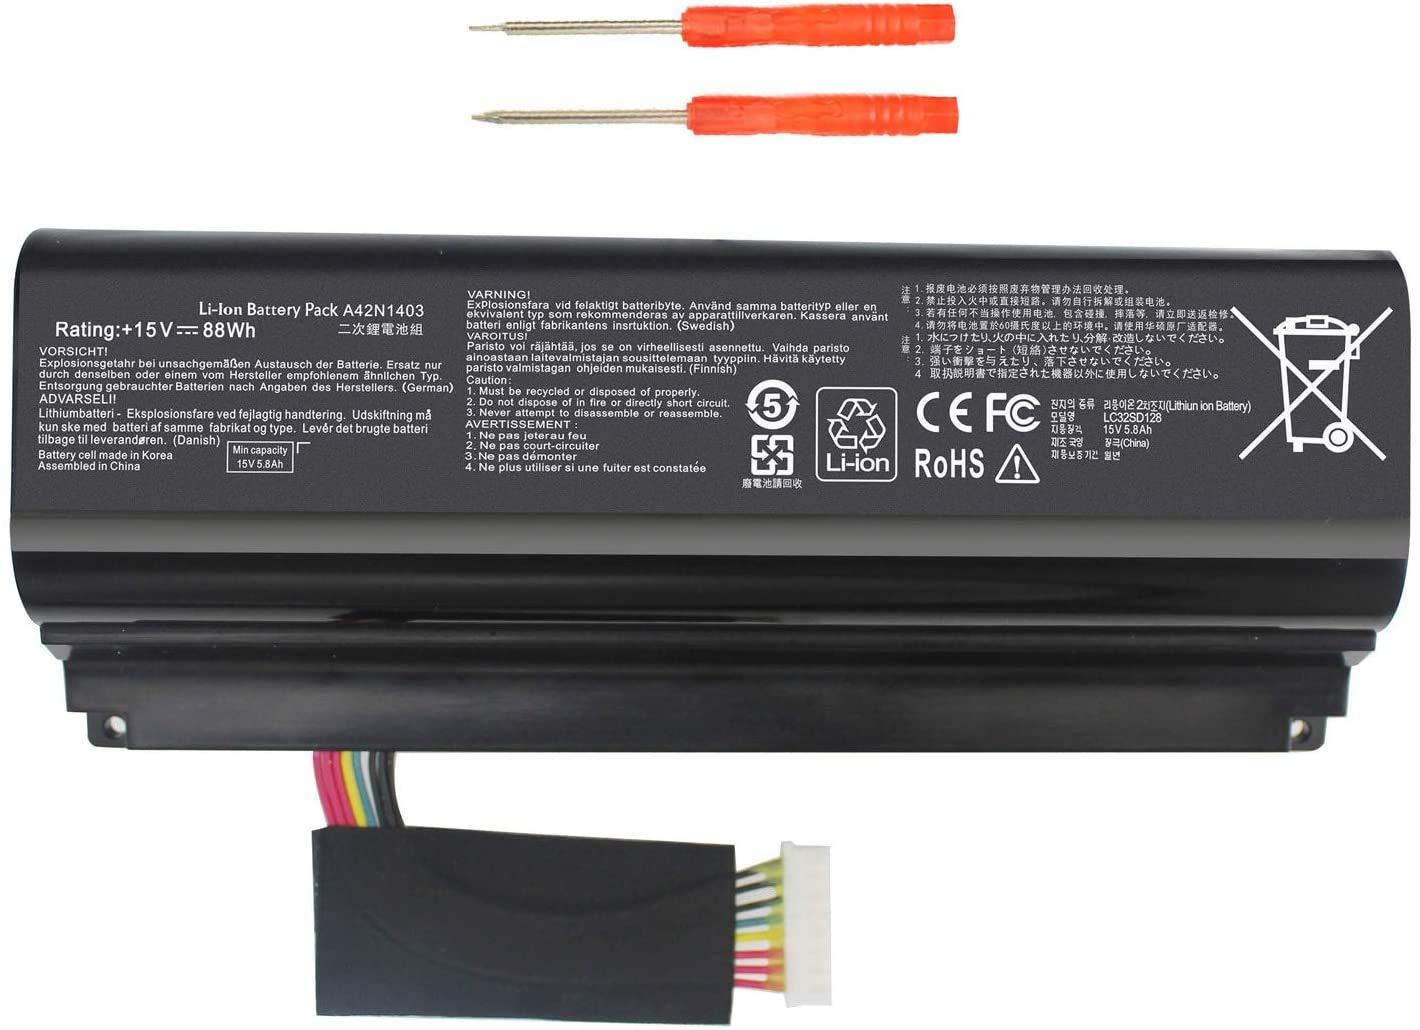 Bateria A42N1403 para ASUS ROG G751JL 17.3 G751 G751JY G751J